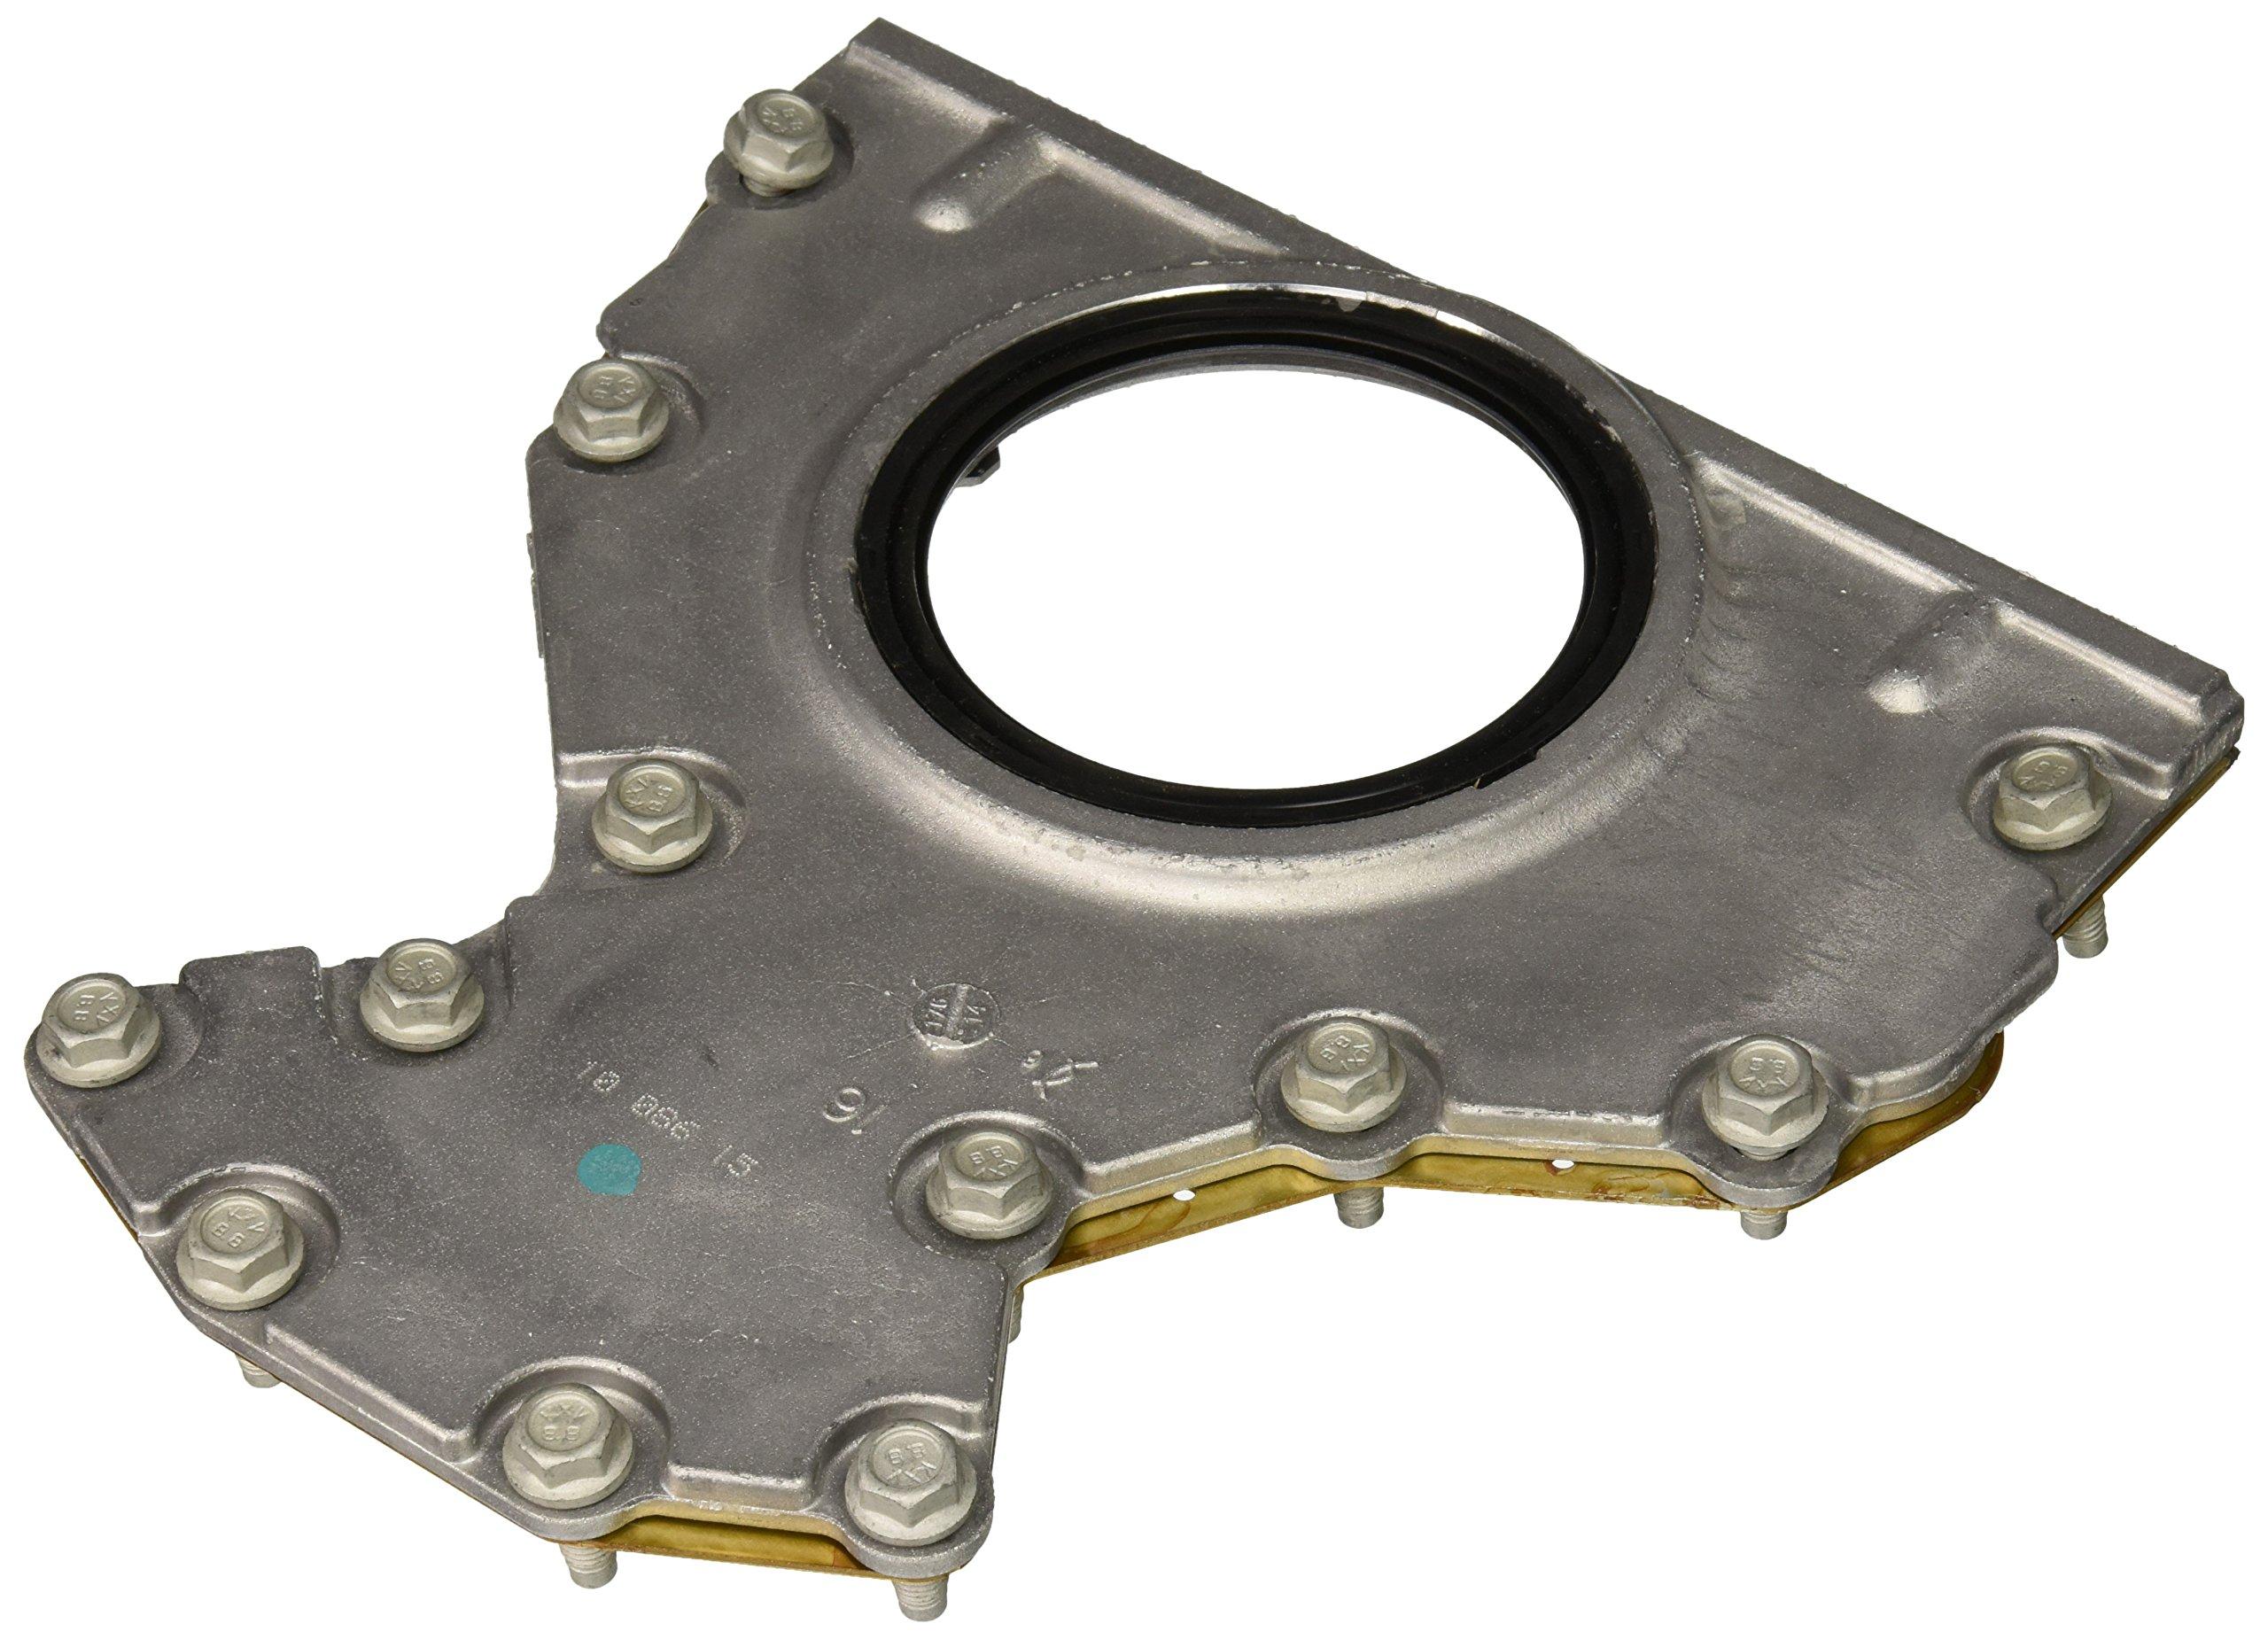 Best Rated in Automotive Replacement Crankshaft Seals